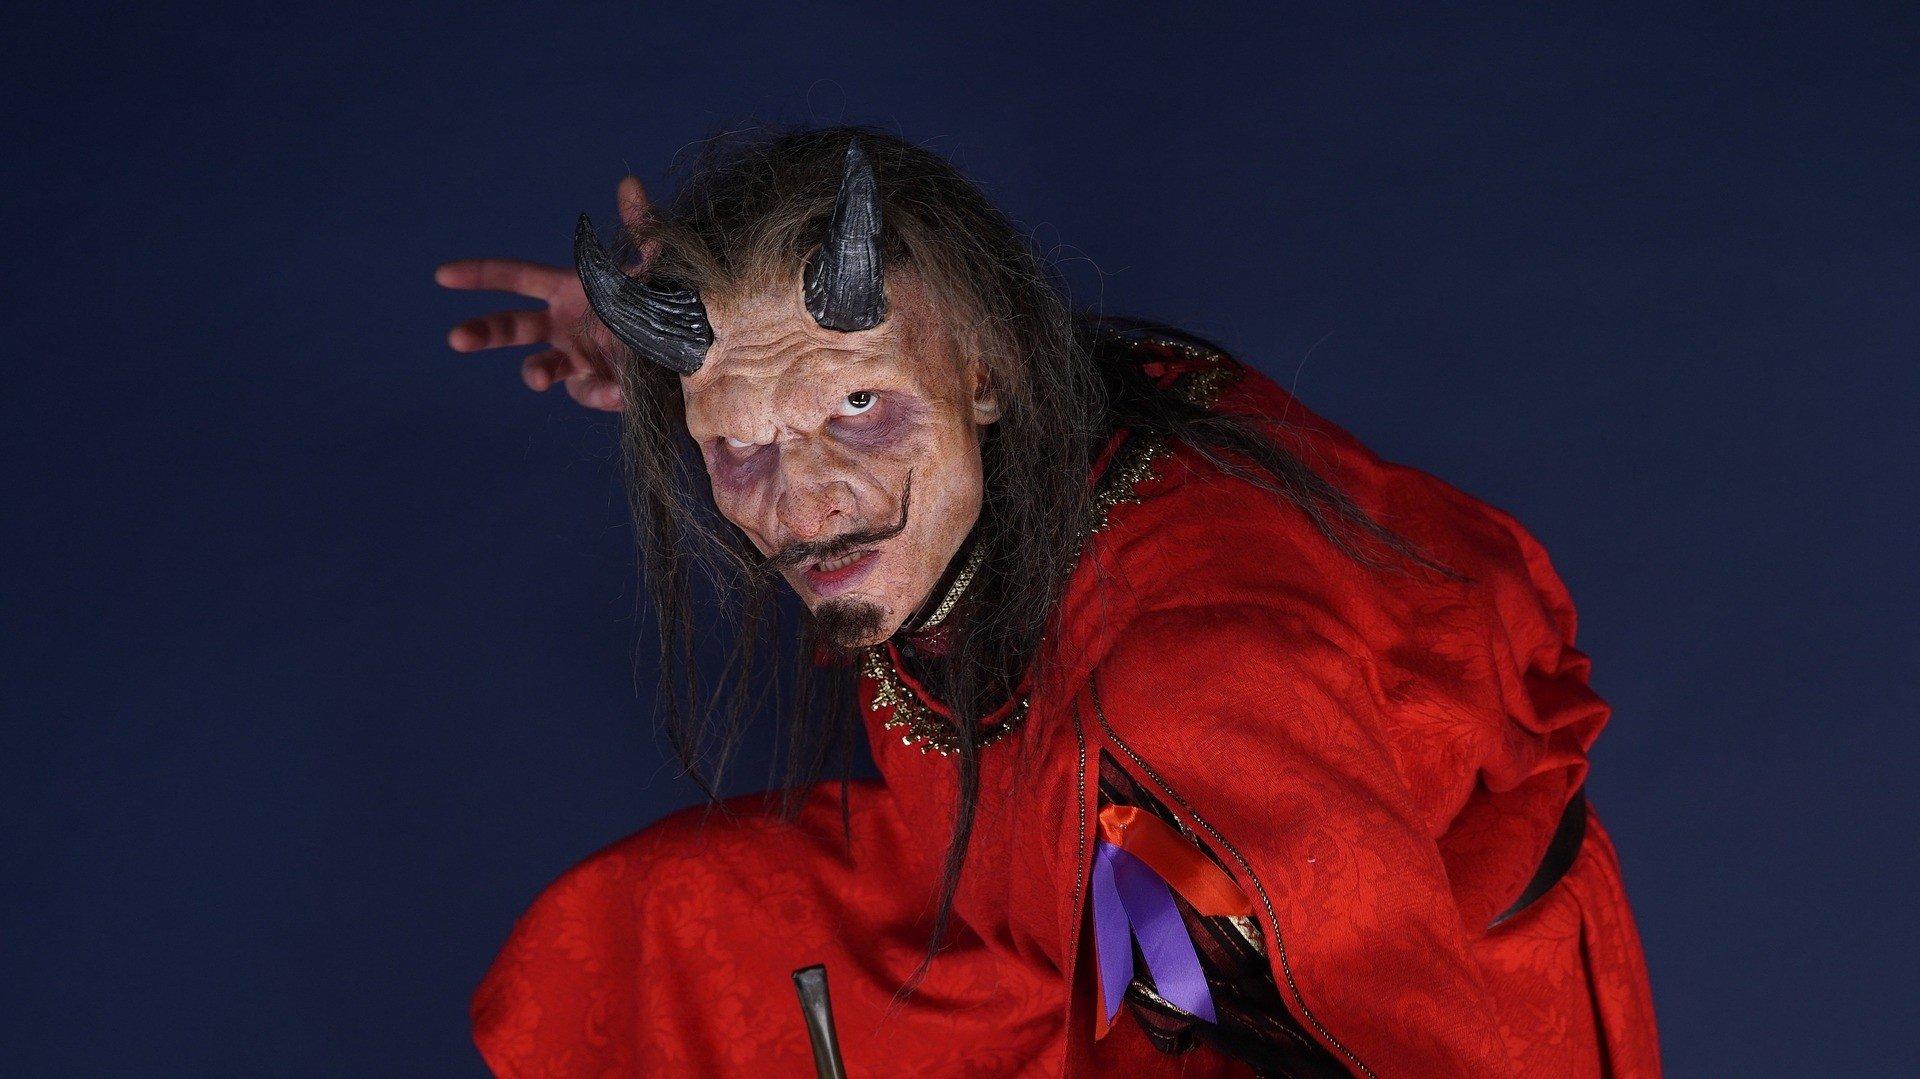 Креативные костюмы для Хэллоуина